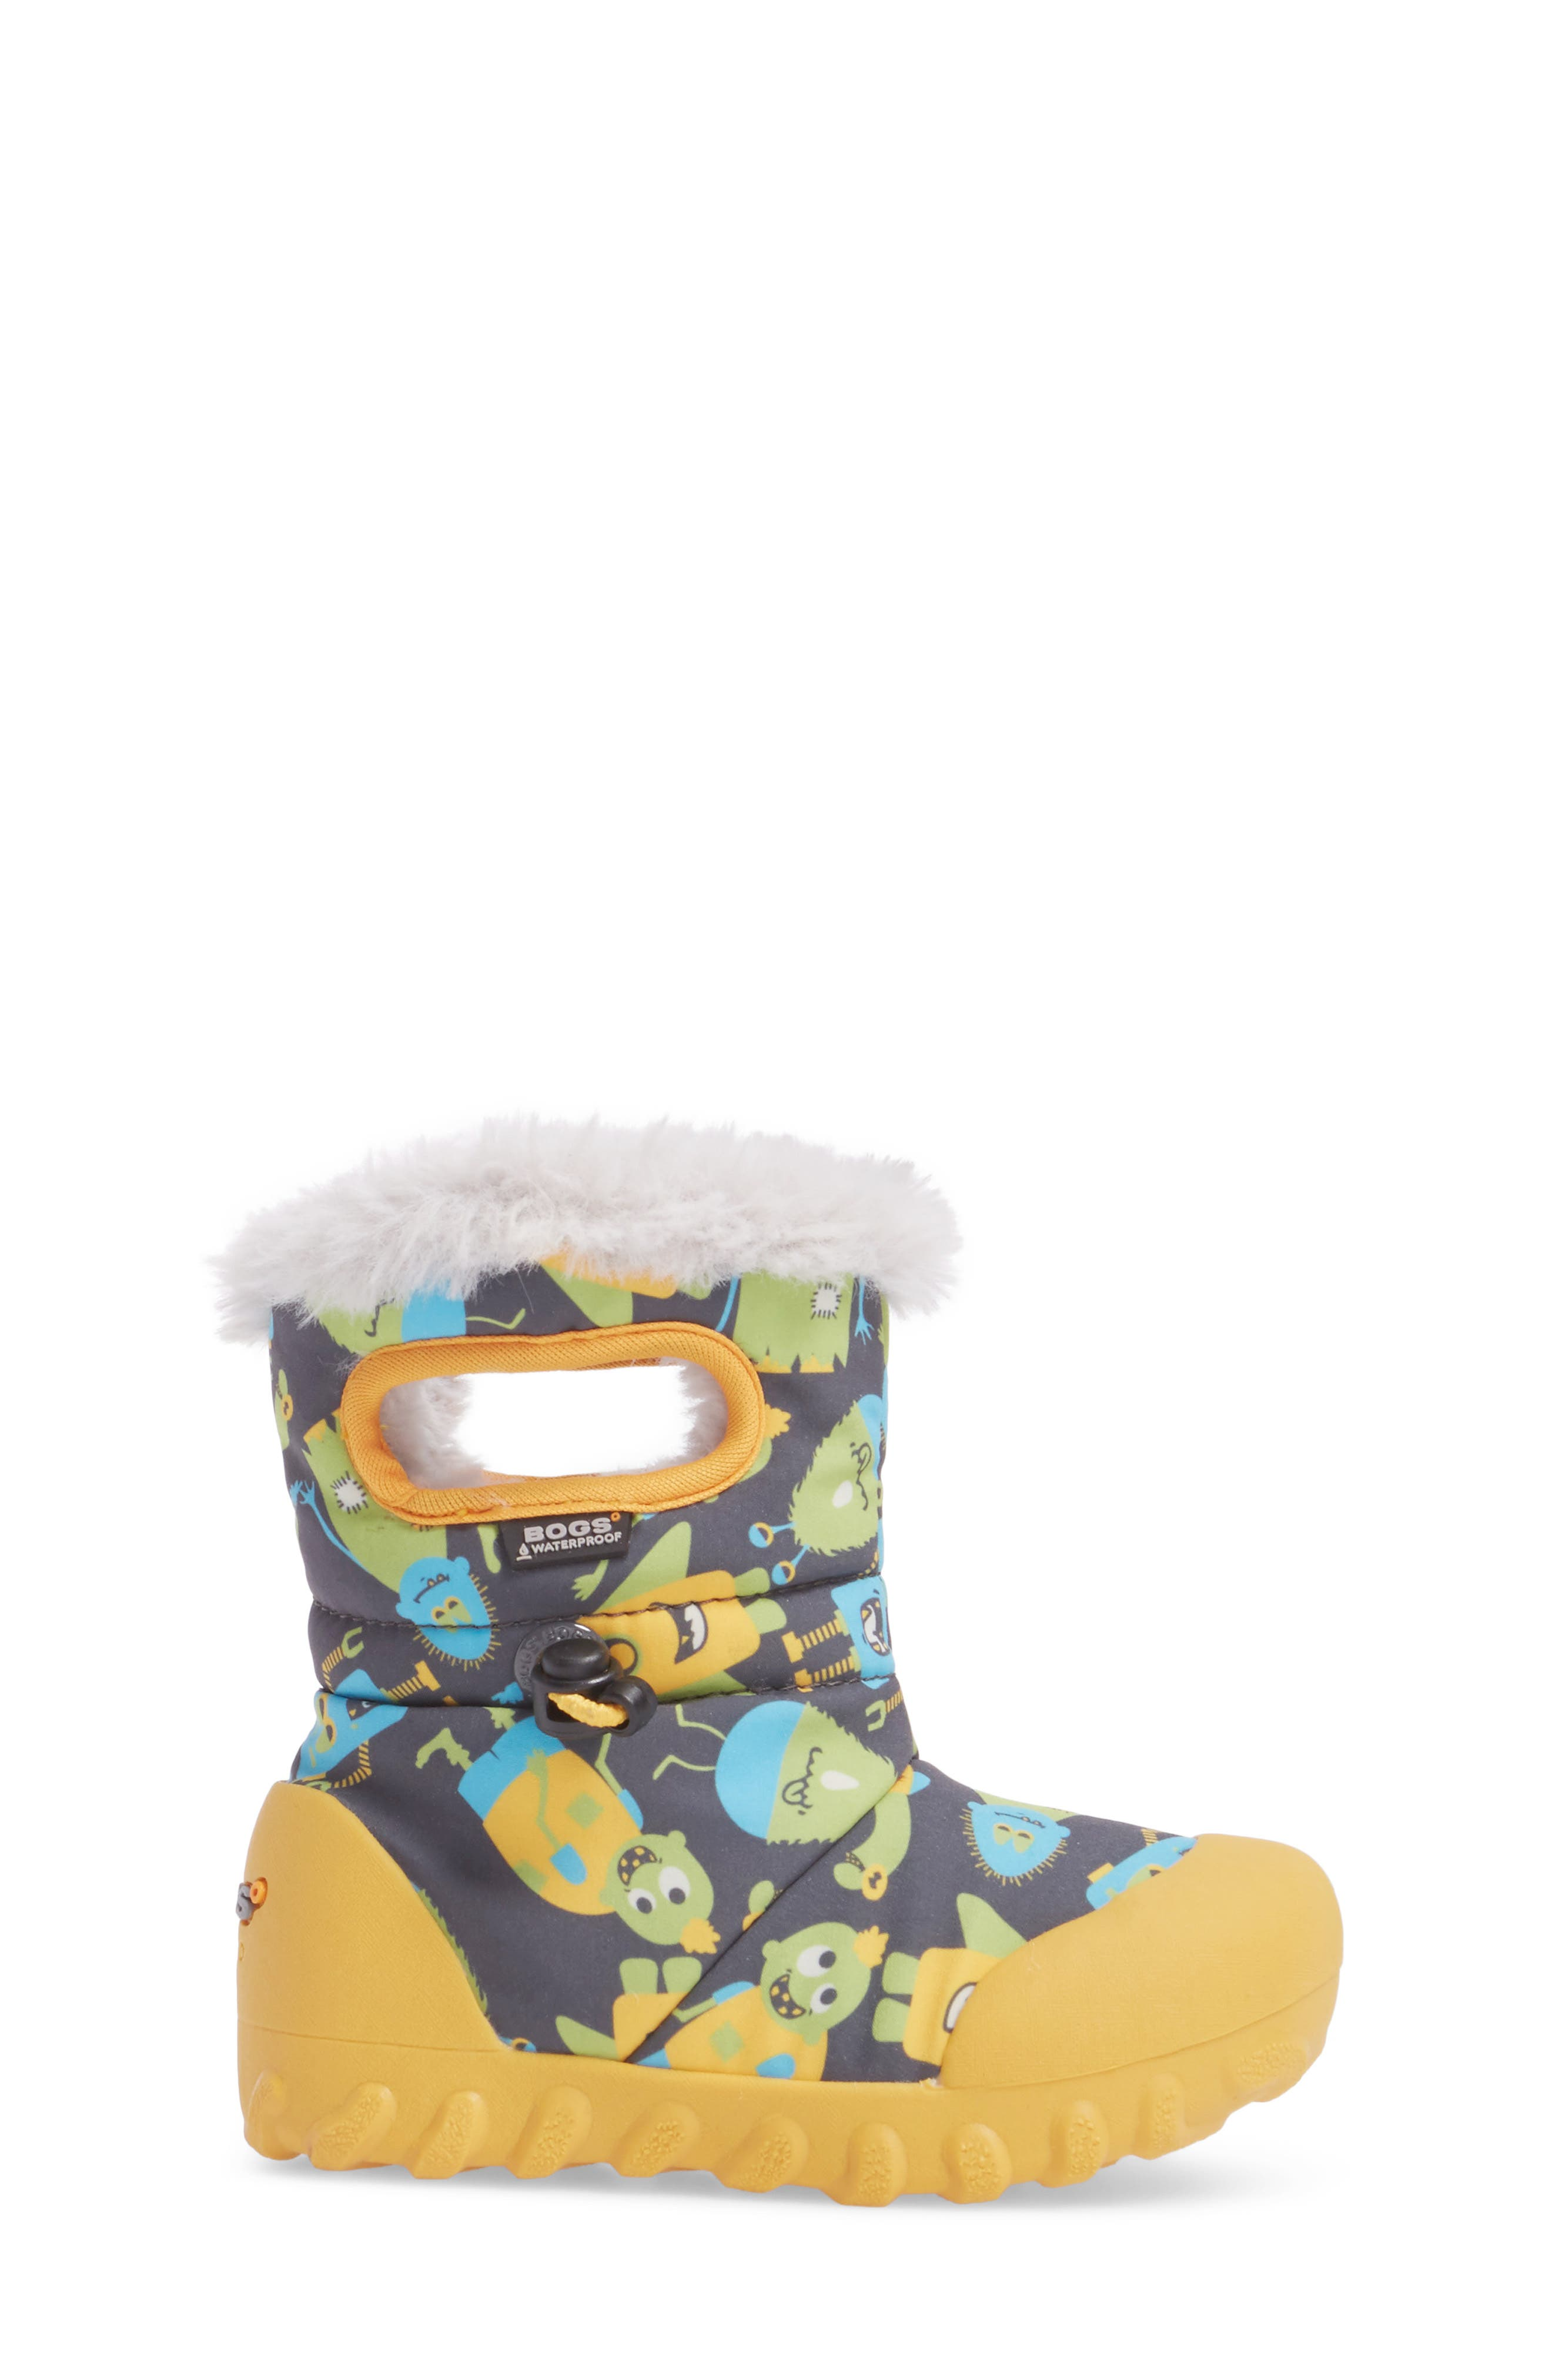 Alternate Image 3  - Bogs B-MOC Monsters Waterproof Insulated Faux Fur Winter Boot (Walker, Toddler, Little Kid & Big Kid)